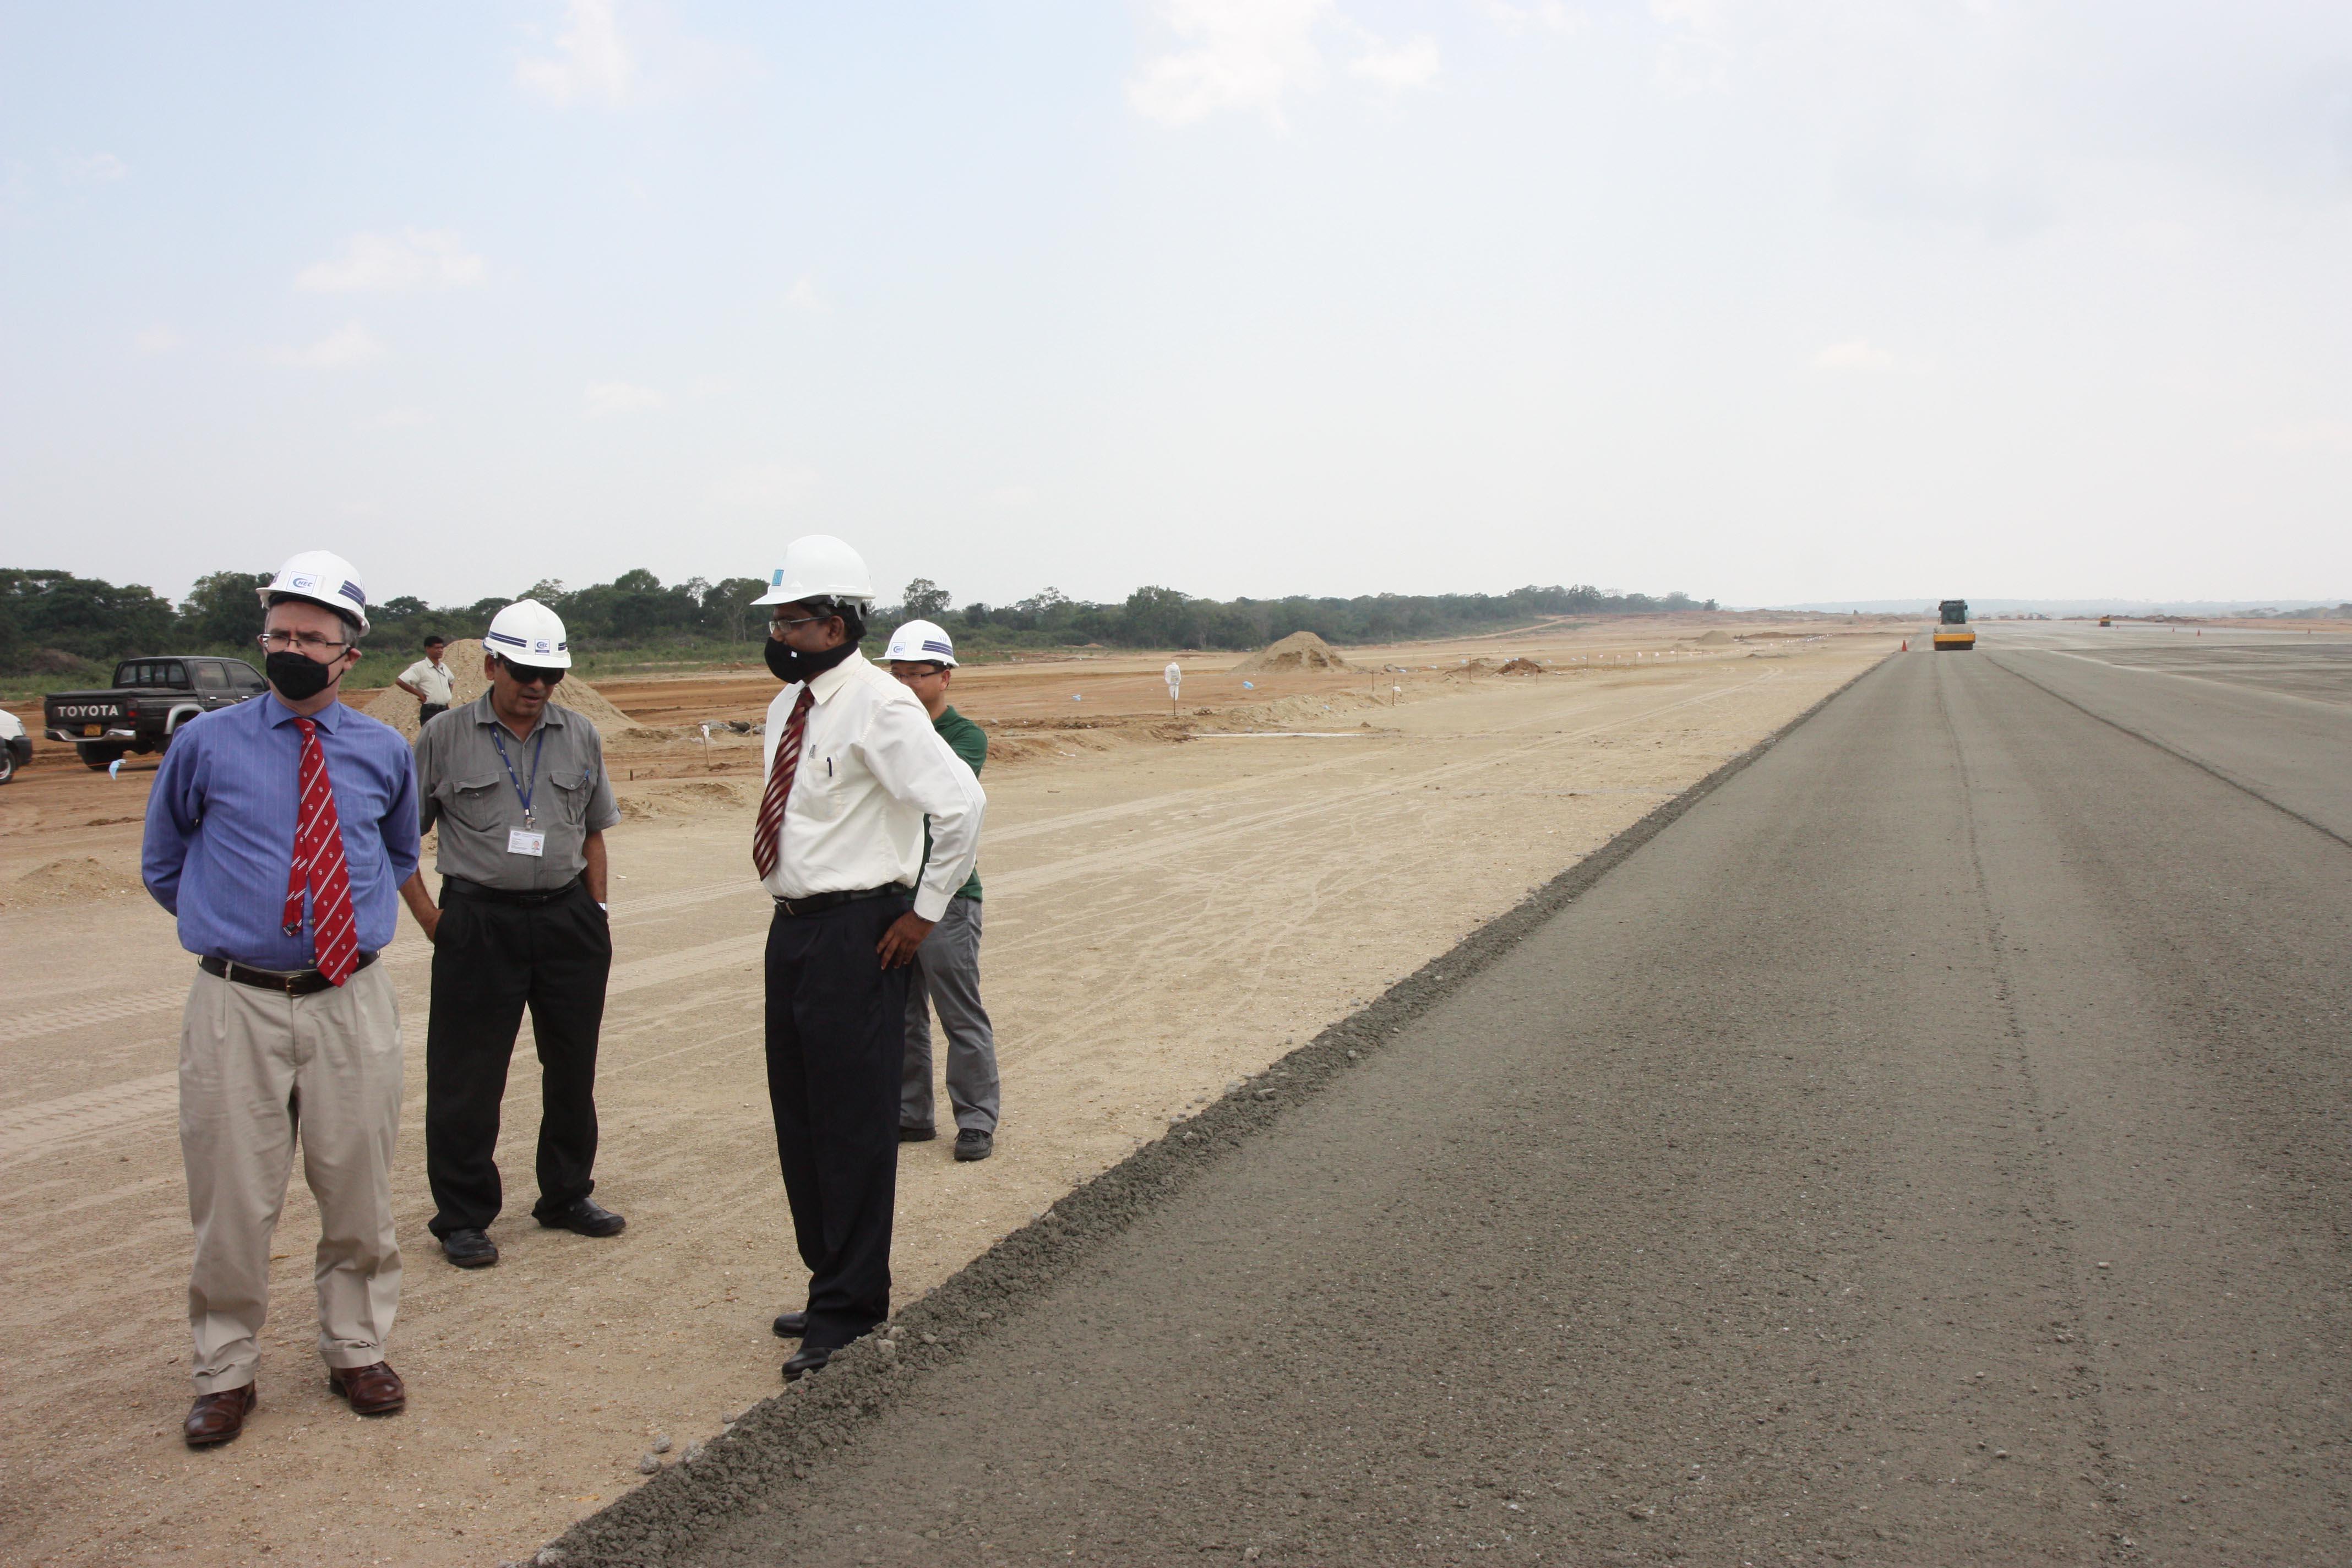 Aéroport Hambantota Sri Lanka Haut Commissaire britannique Visite Diplomatique